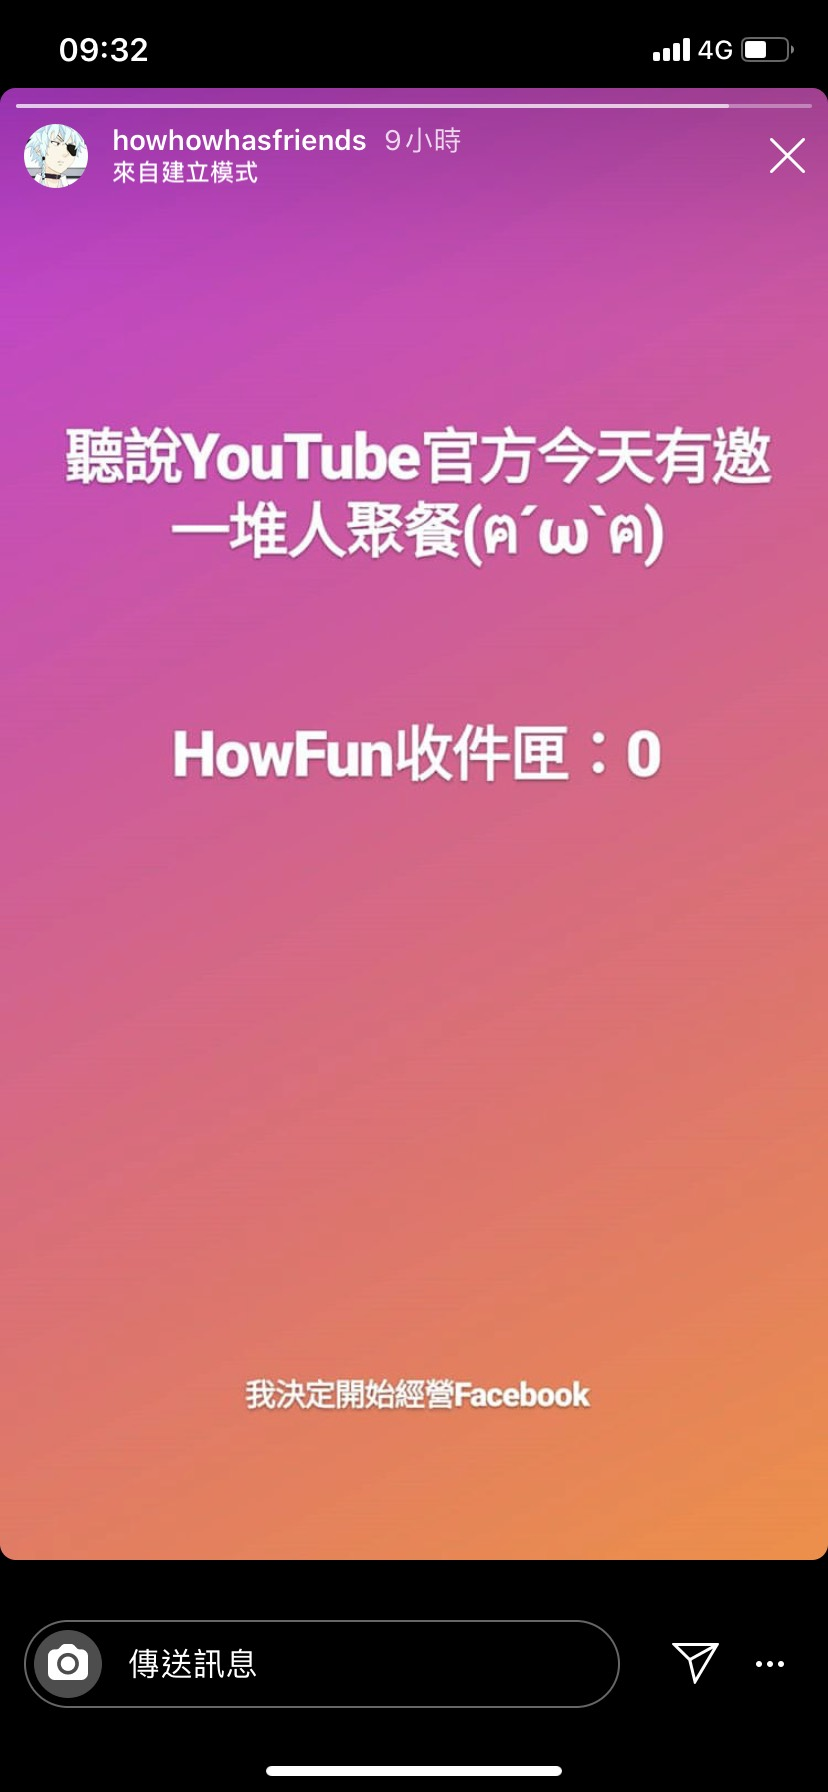 HowHow自爆「YT聚會沒邀他」慘變邊緣人!他心酸PO文:改經營FB了